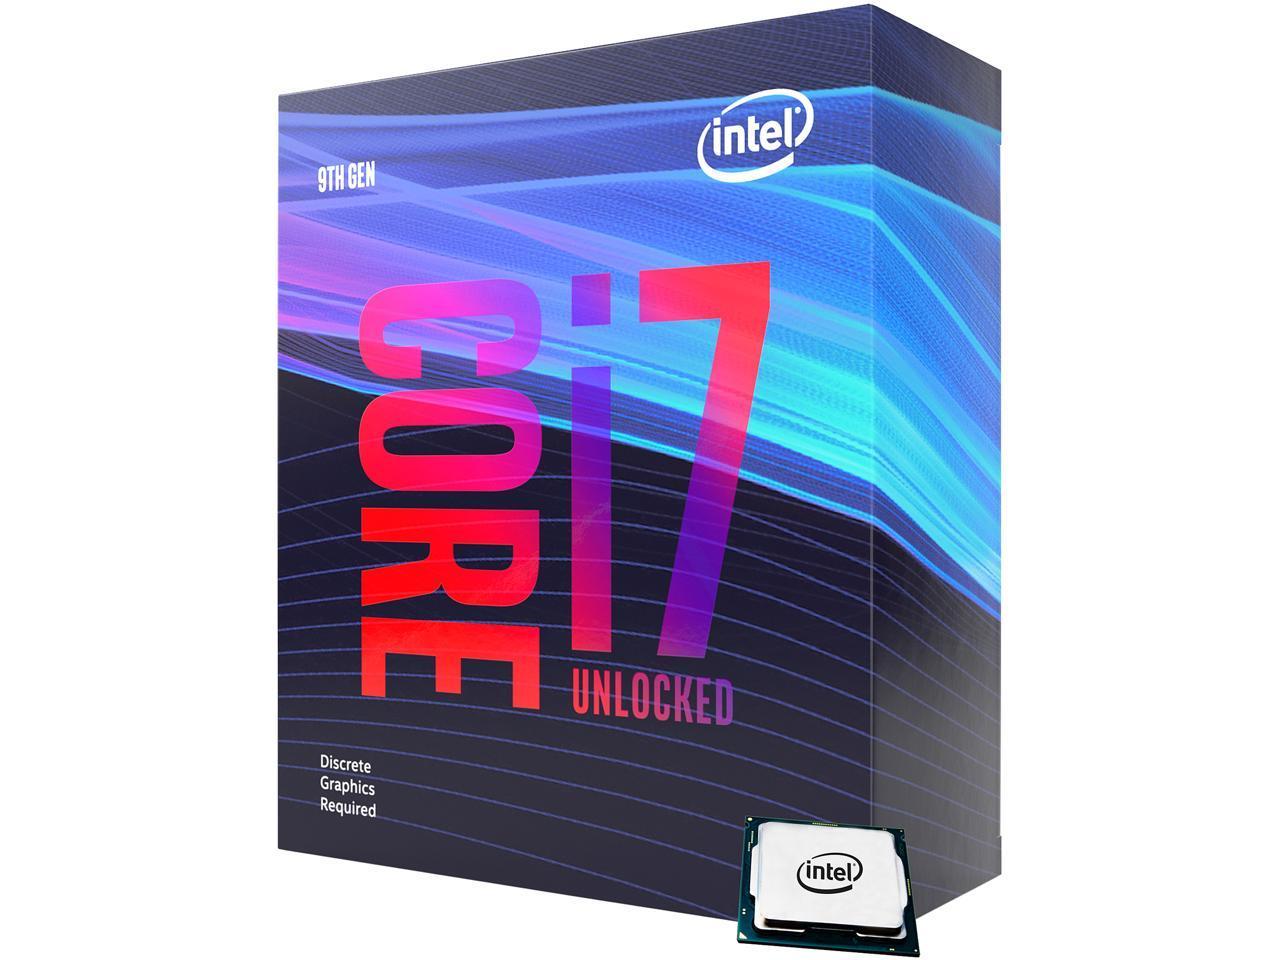 Intel Core I7 9700kf Coffee Lake 8 Core 3 6 Ghz 4 9 Ghz Turbo Lga 1151 300 Series 95w Bx80684i79700kf Desktop Processor Without Graphics Newegg Com